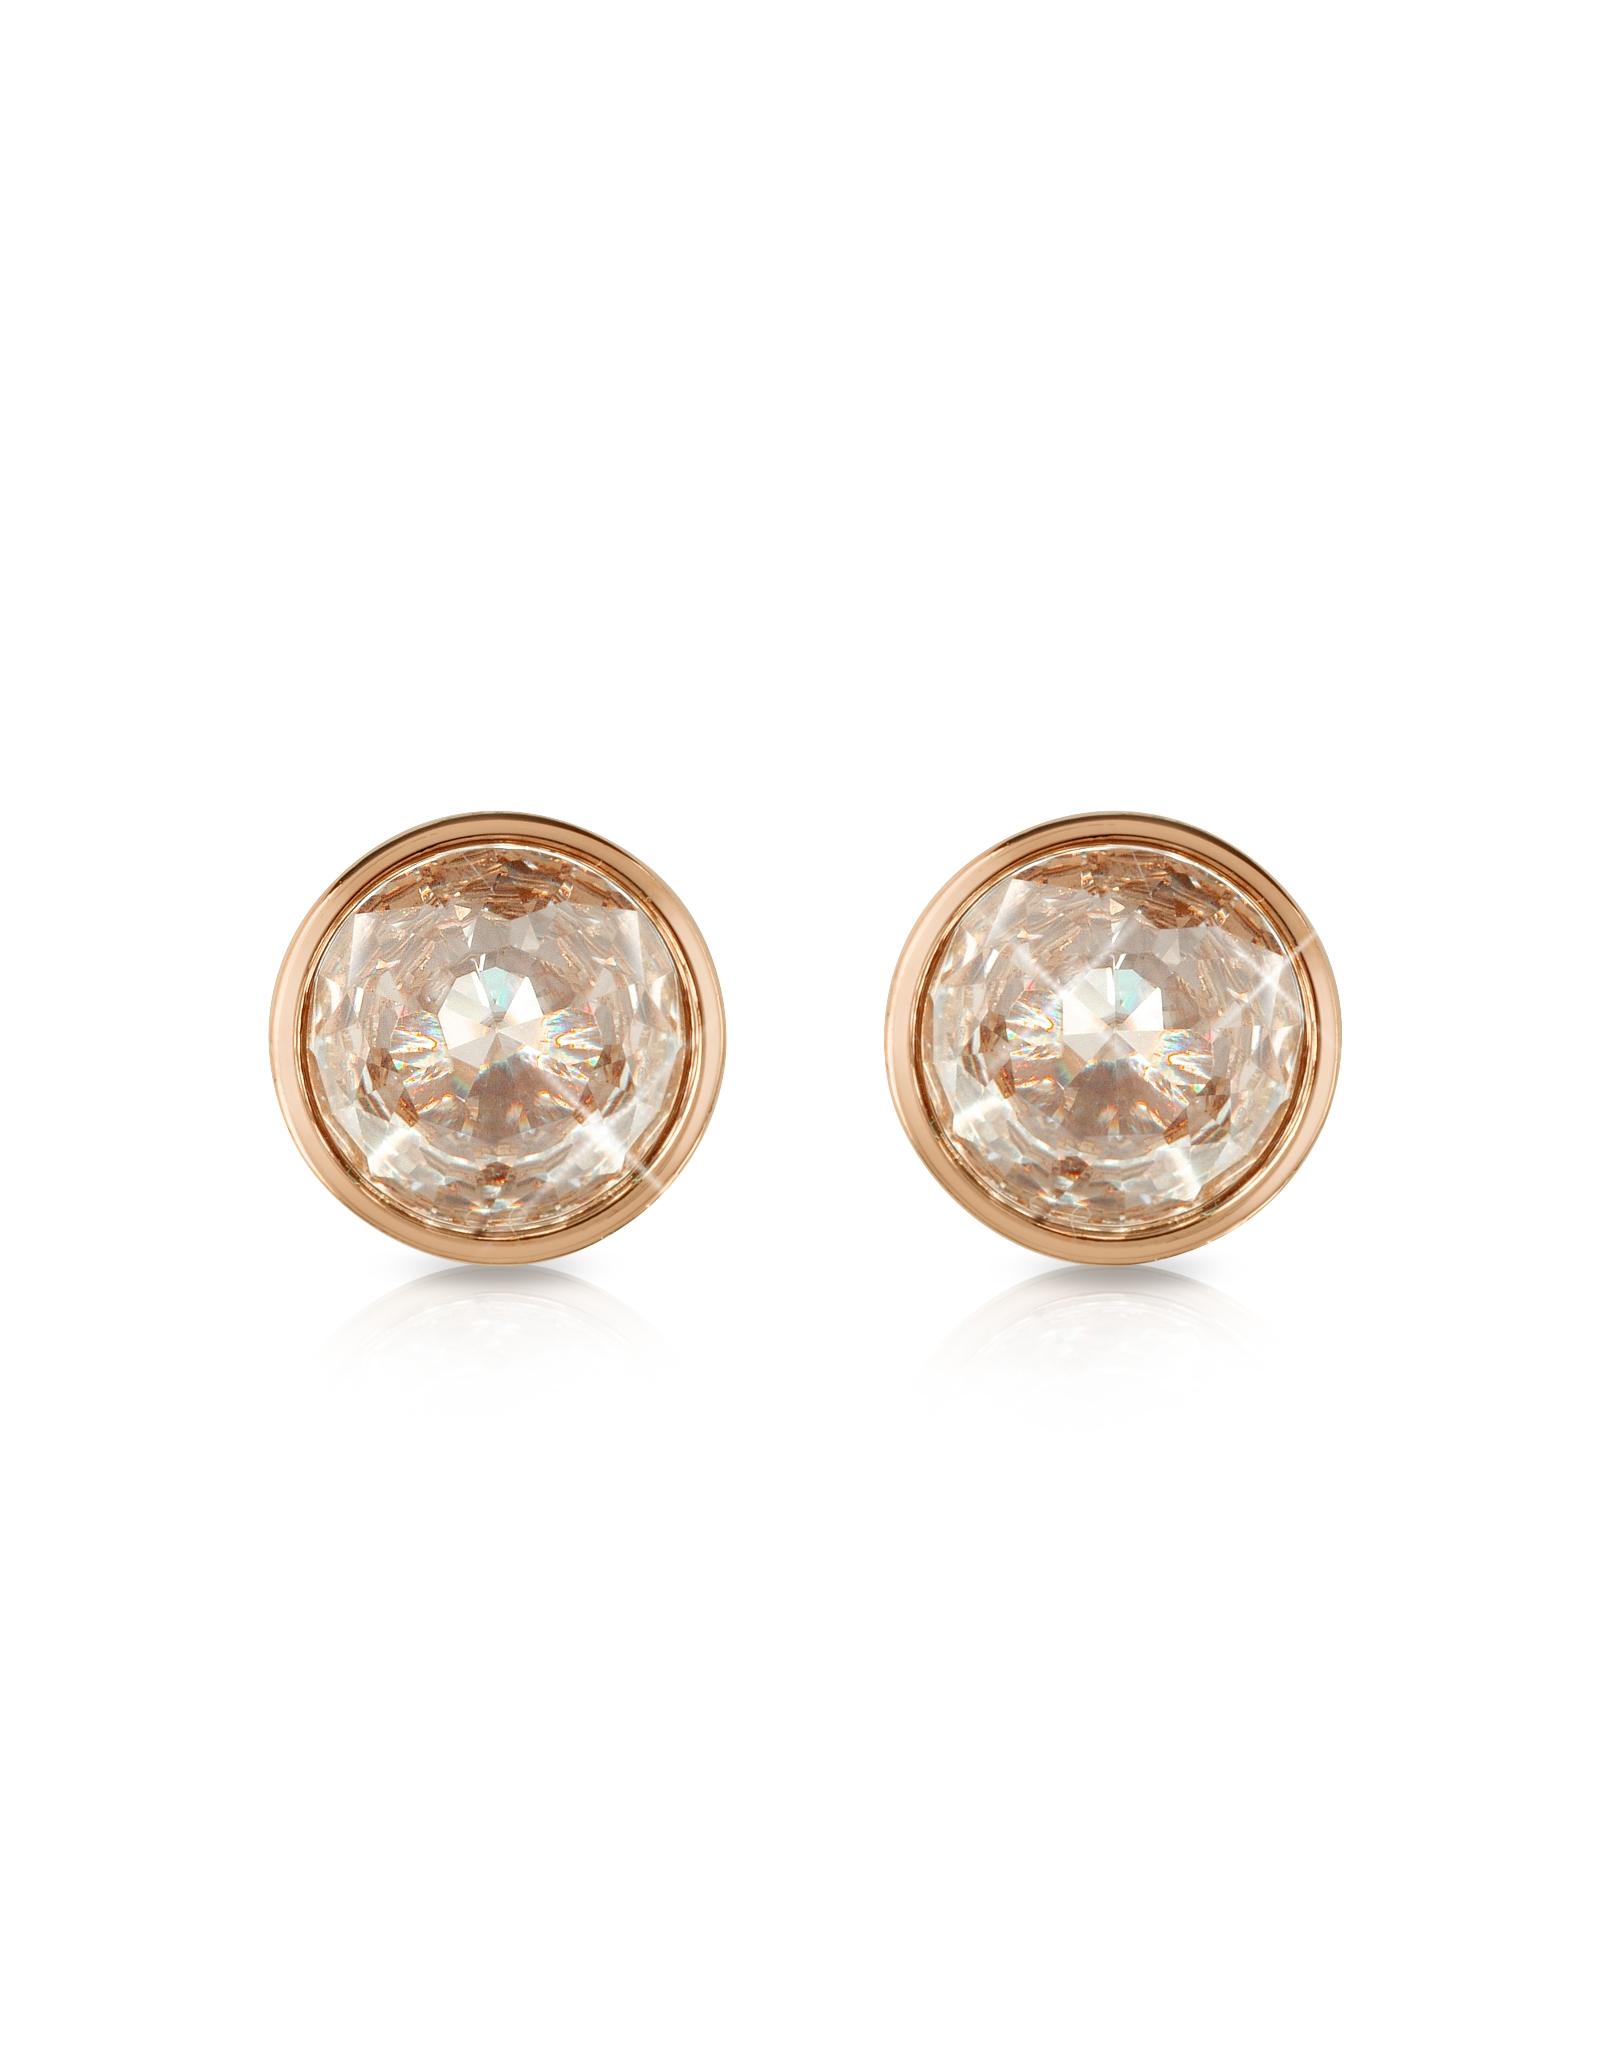 Lyst Michael Kors Crystal Rose Gold Tone Stud Earrings In Metallic